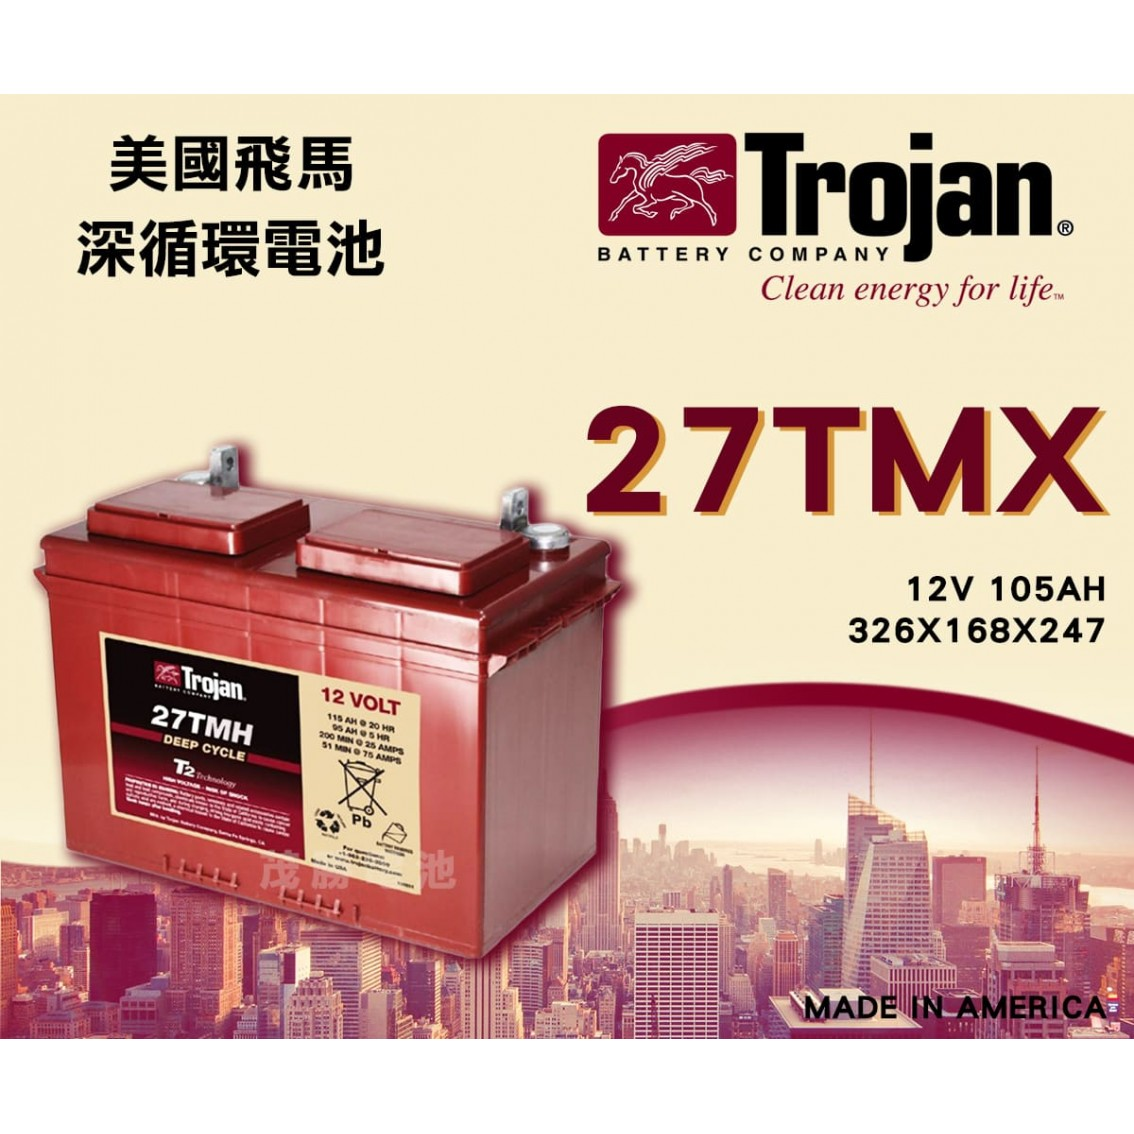 27 TMX